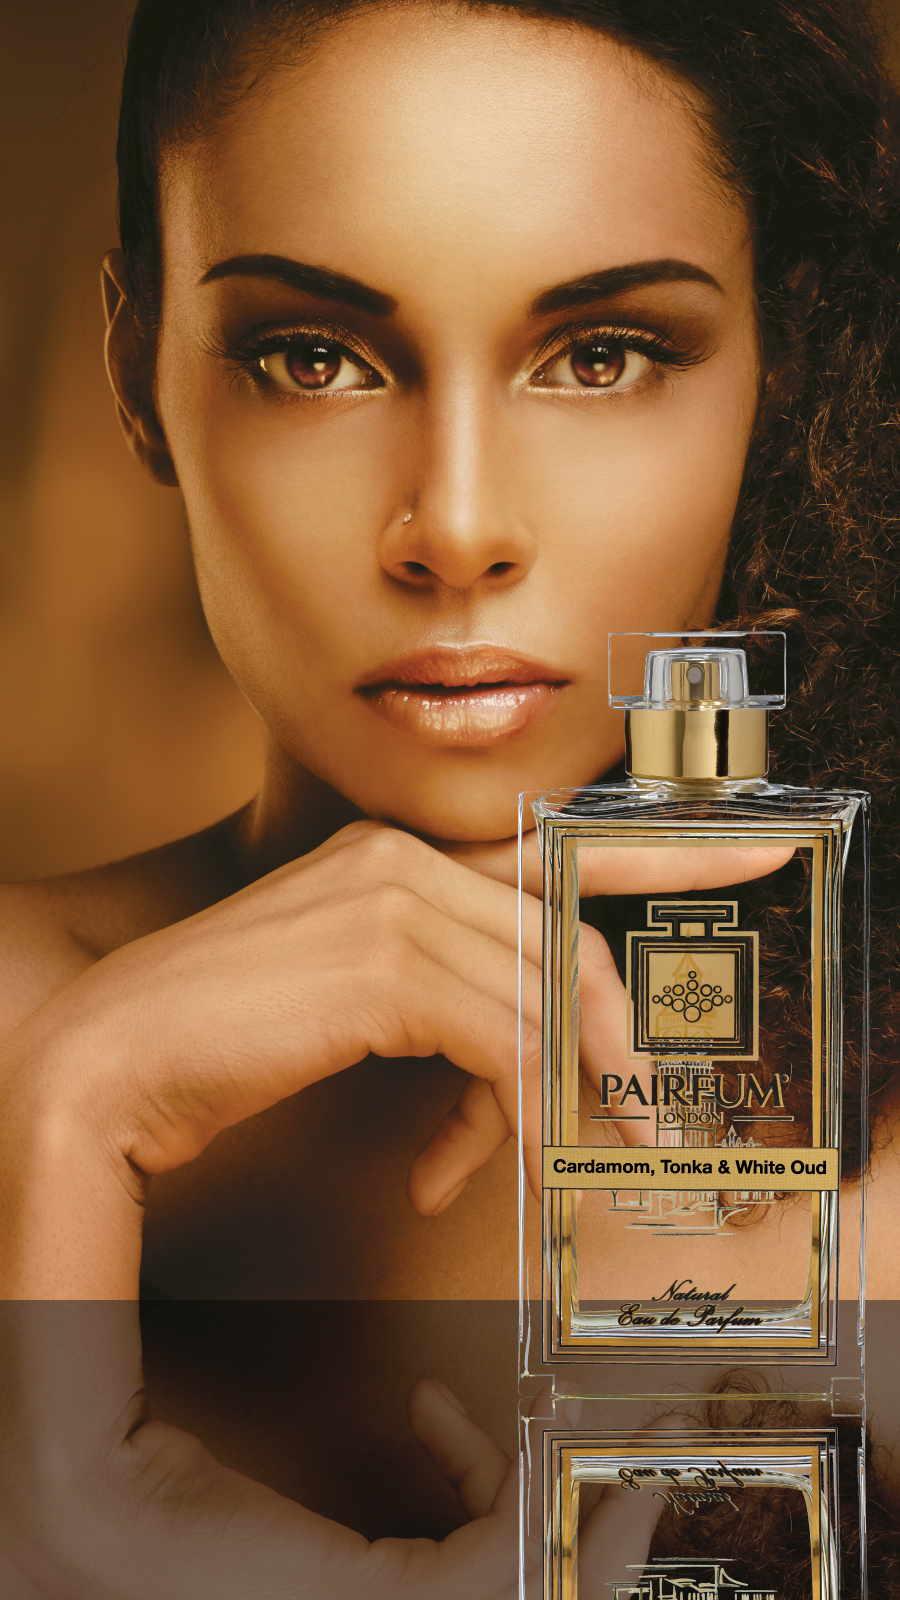 Eau De Parfum Person Reflection Cardamom Tonka White Oud Woman 9 16